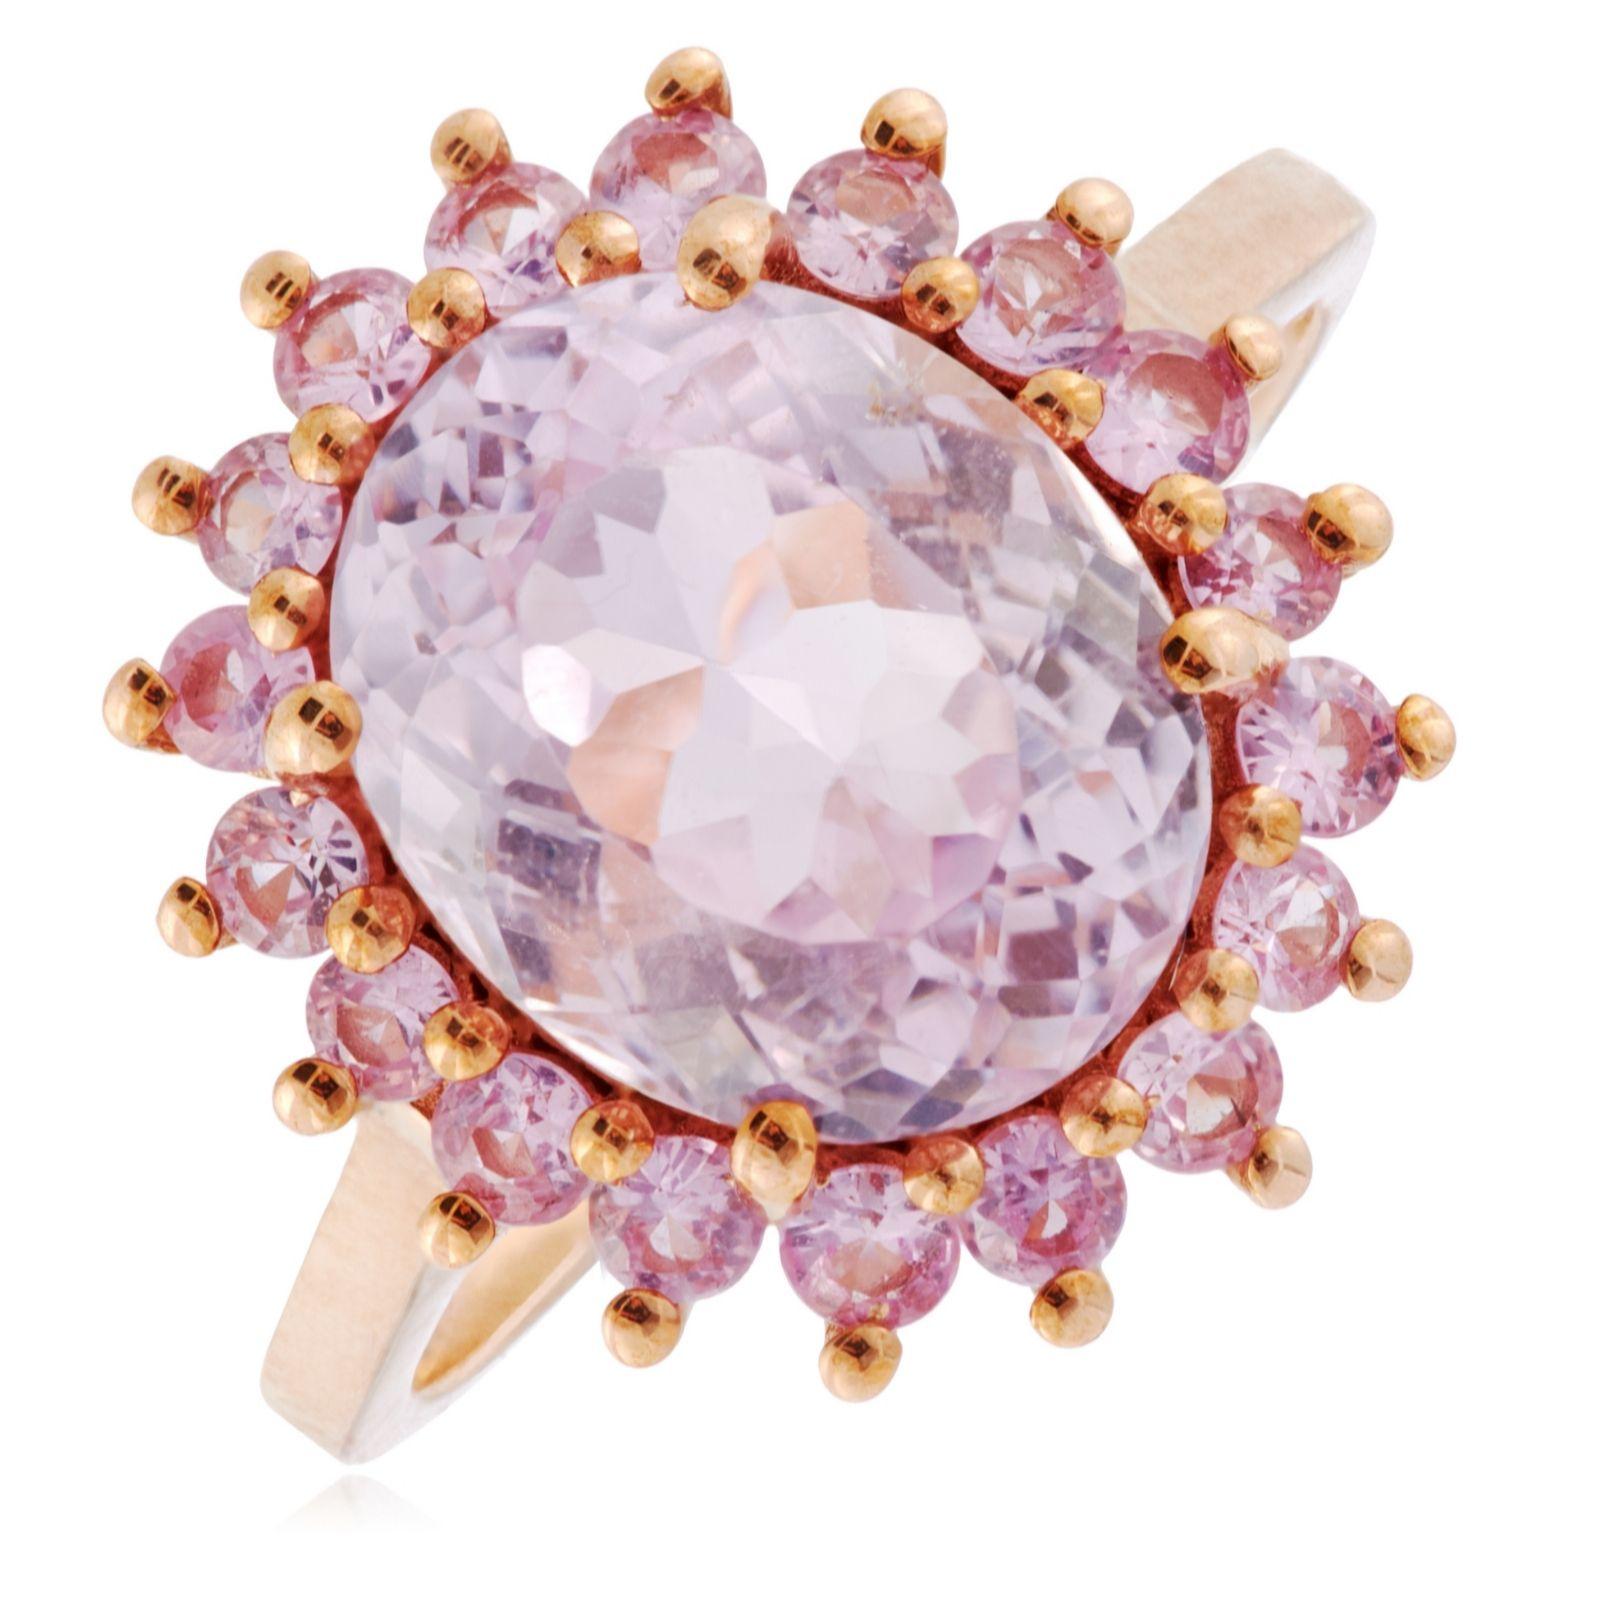 3ac249b17b2c0 4.00ct Kunzite & 0.70ct Pink Sapphire Halo Cocktail Ring 9ct Gold - QVC UK